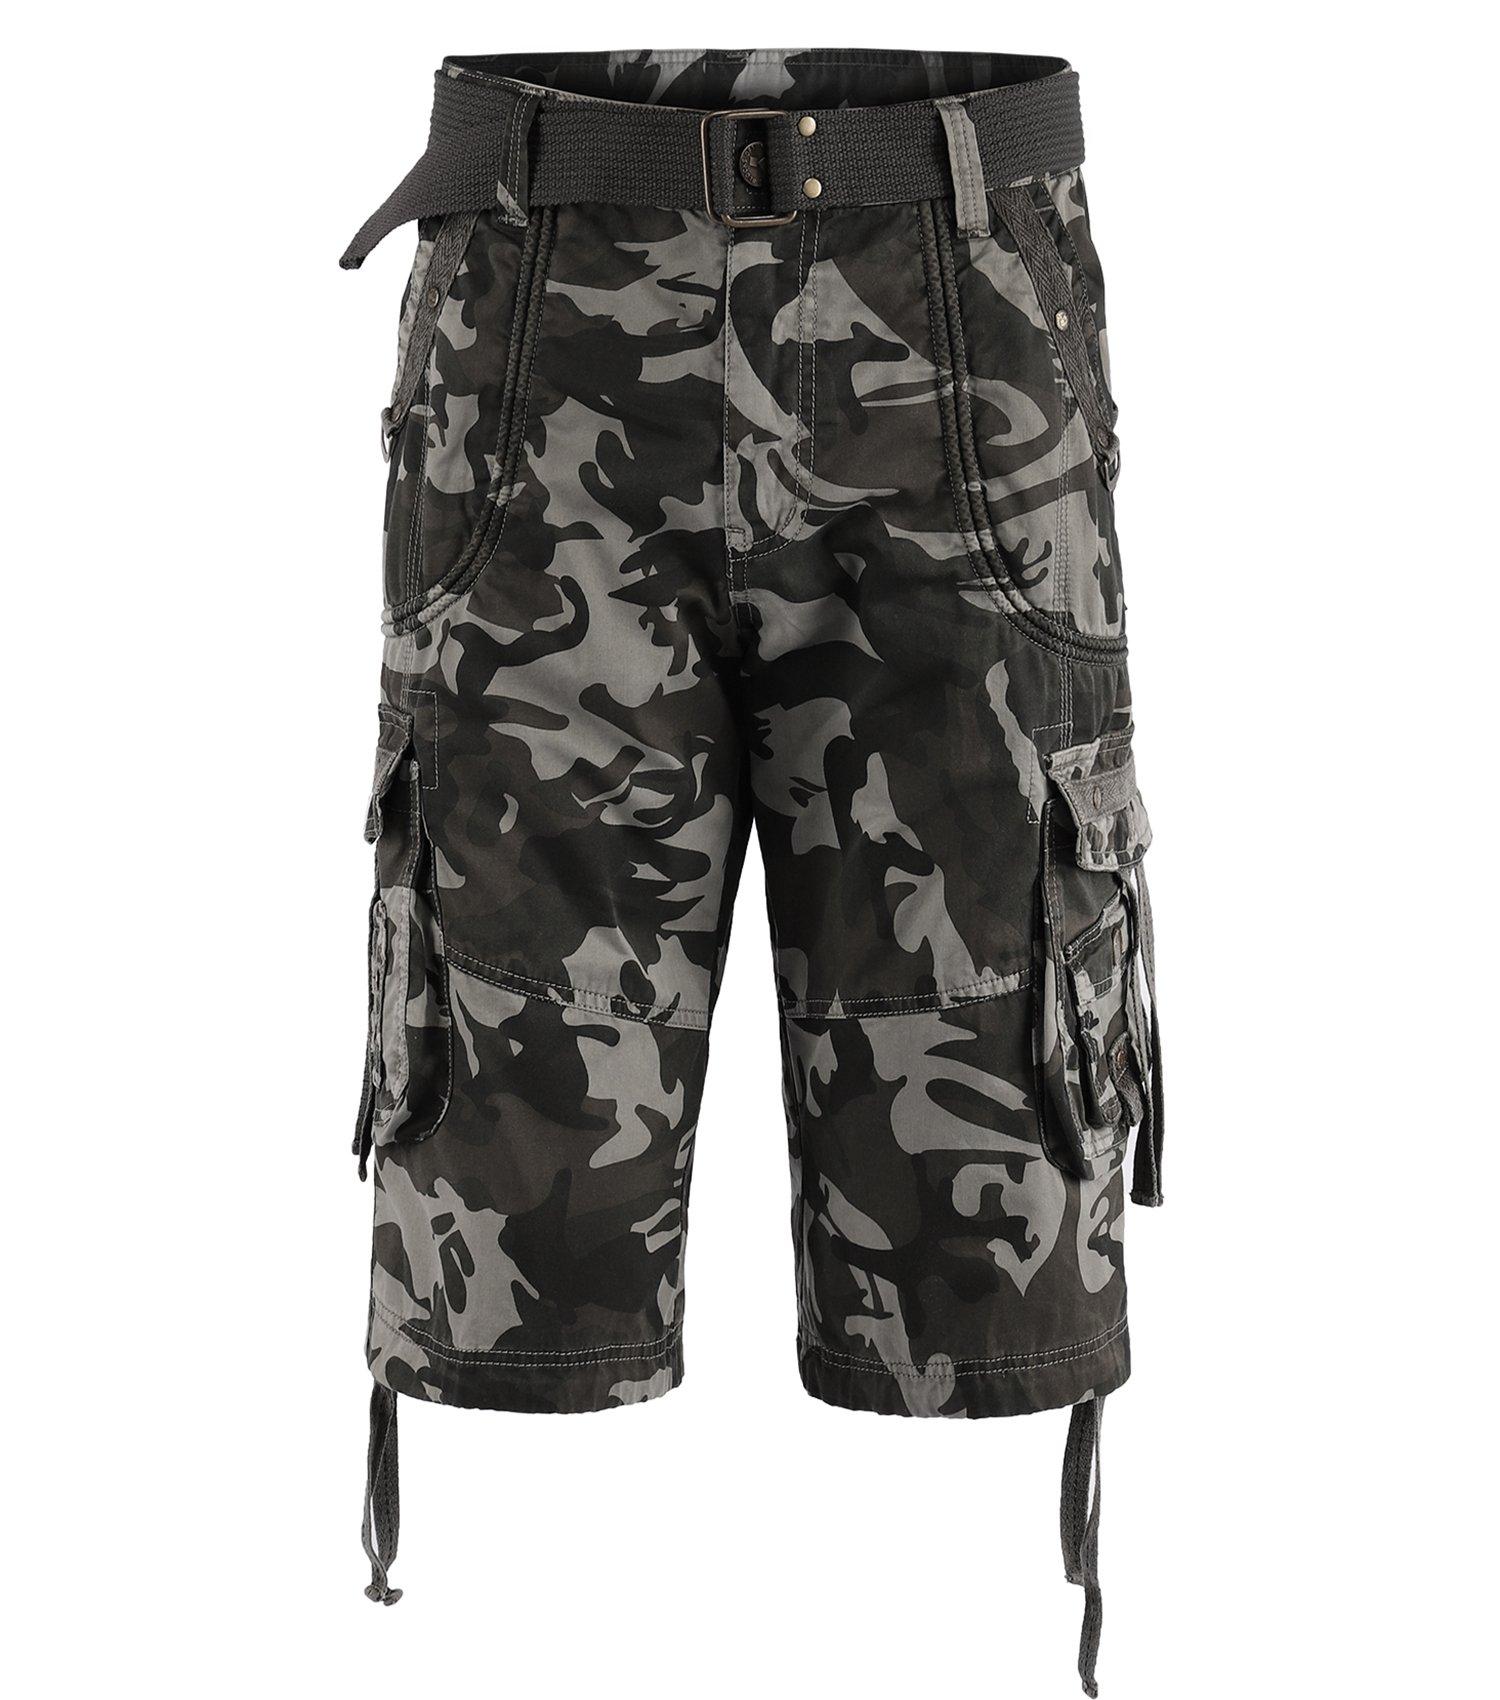 TWO BLOCKS OFF Men's Classic-Fit Cargo Short/Waist Belt/Multiple Pockets Sand Storm Camo Size 36